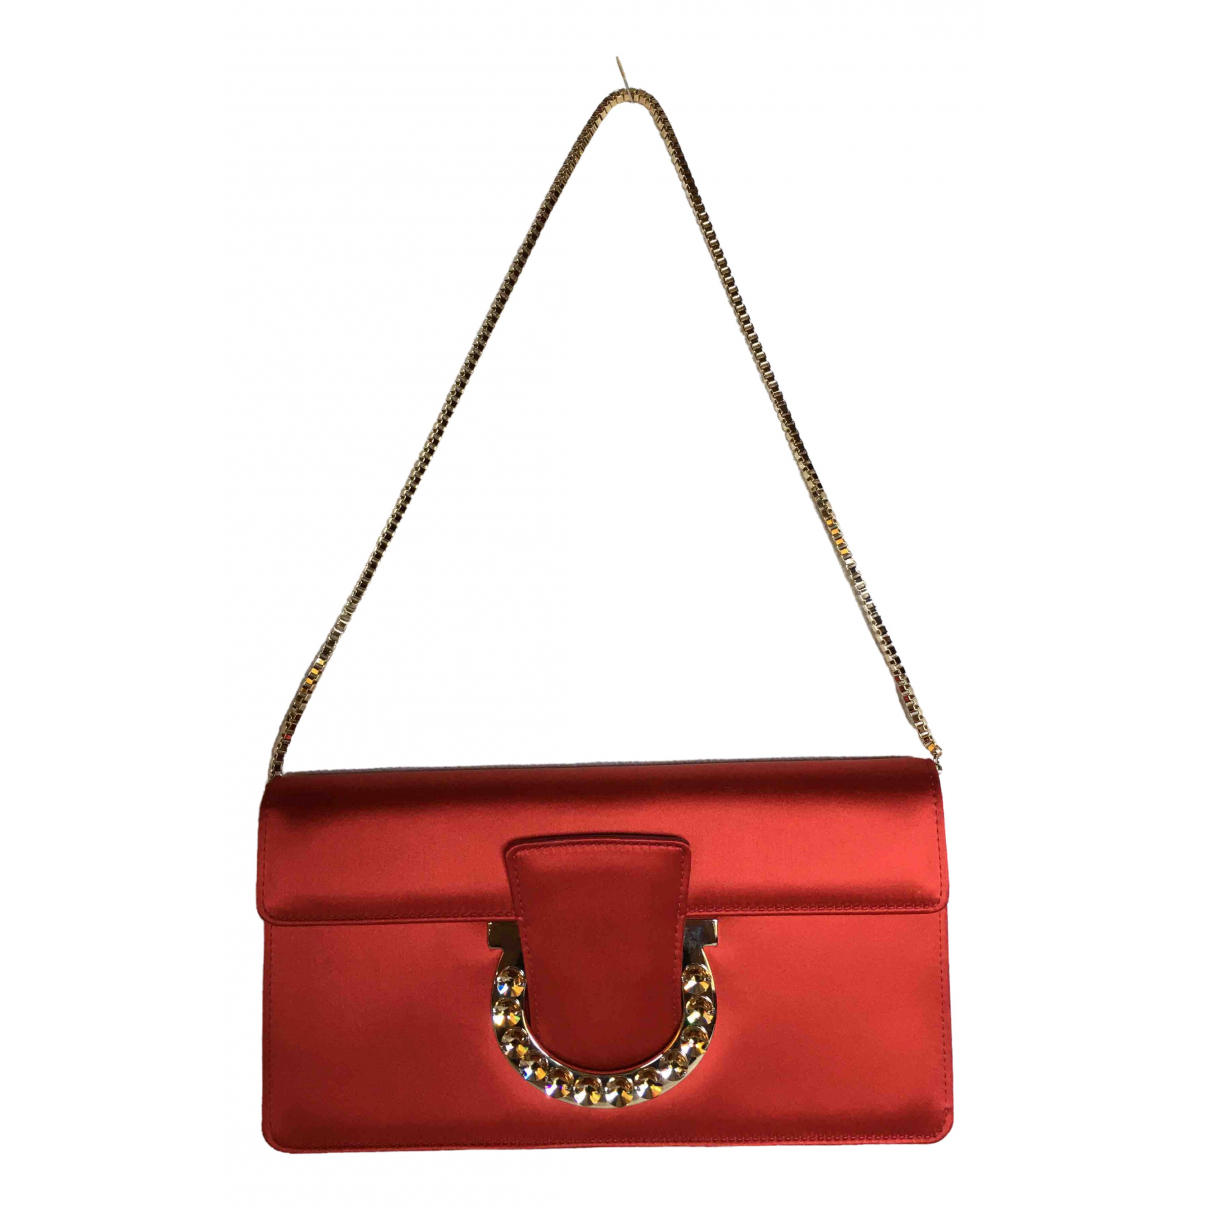 Salvatore Ferragamo \N Red Silk handbag for Women \N